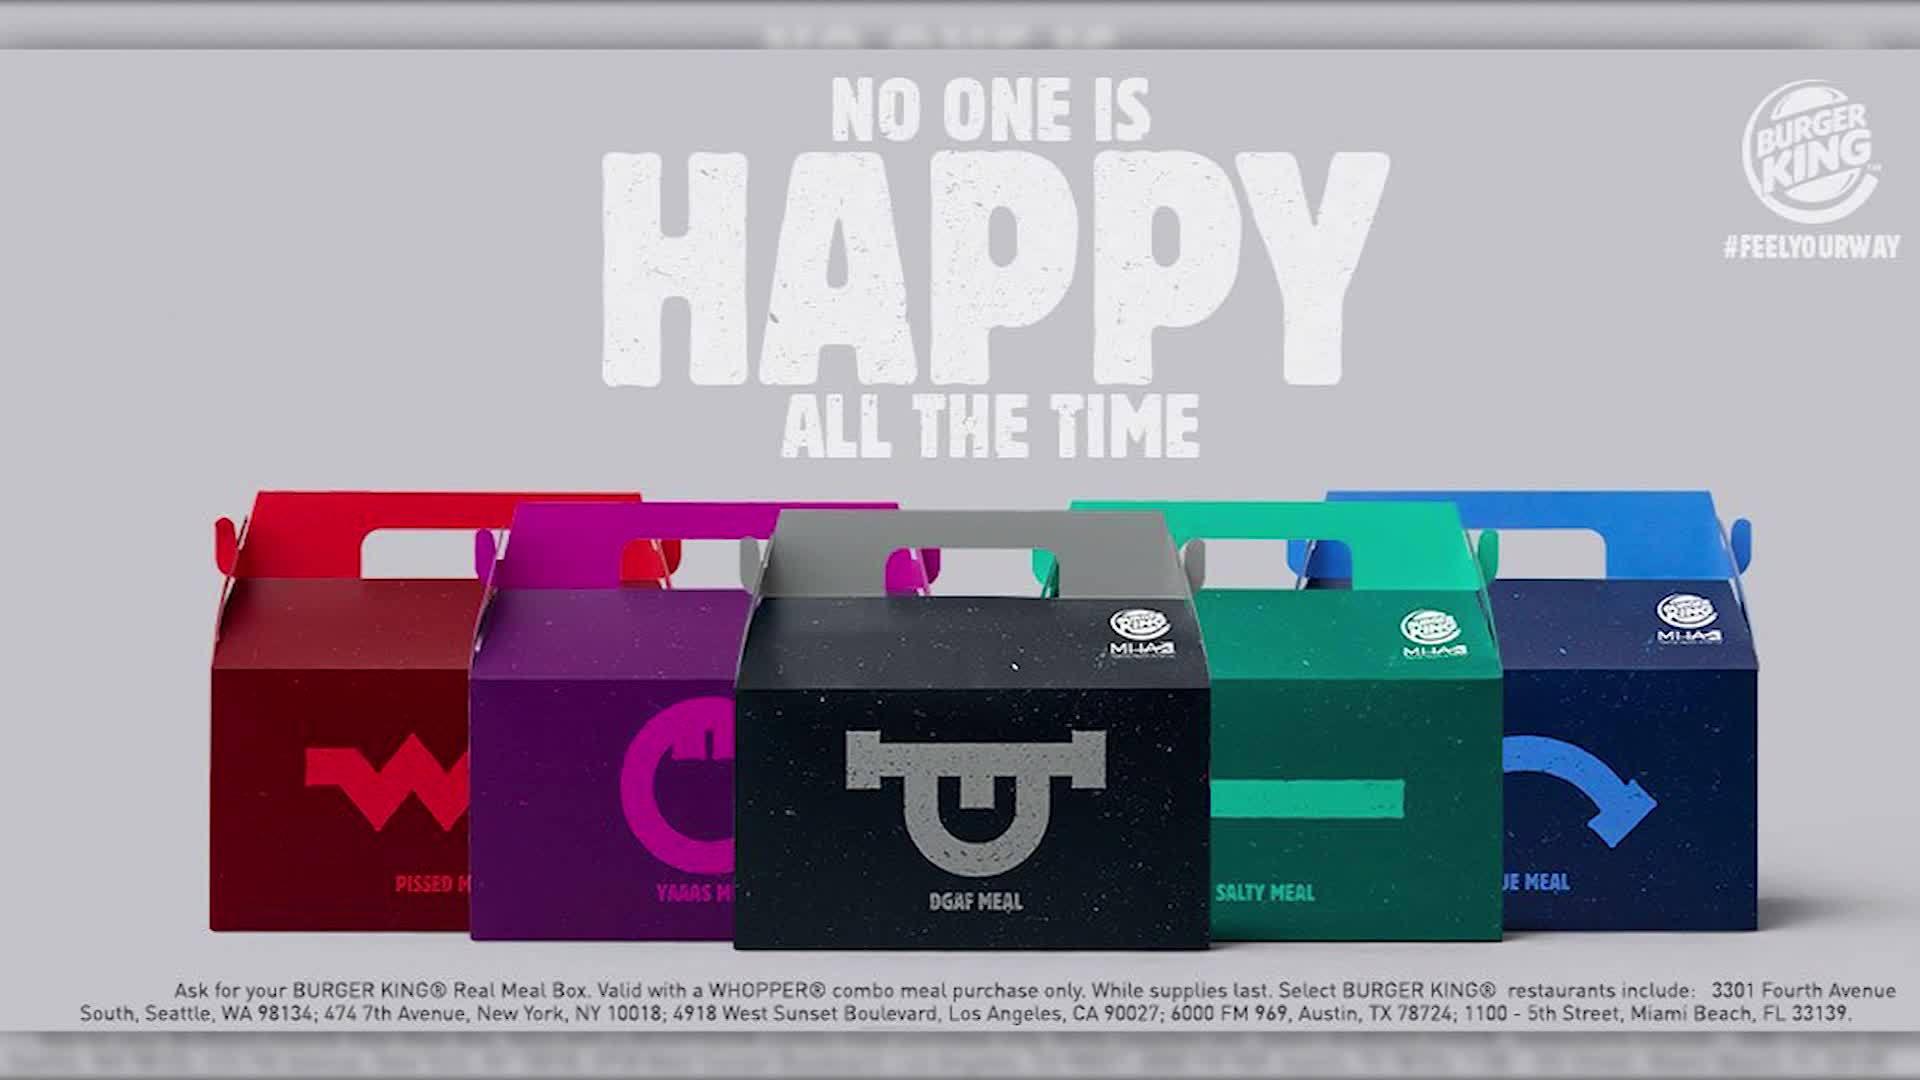 VIDEO__Burger_King_debuts_adult__unhappy_1_20190502130708-873704001